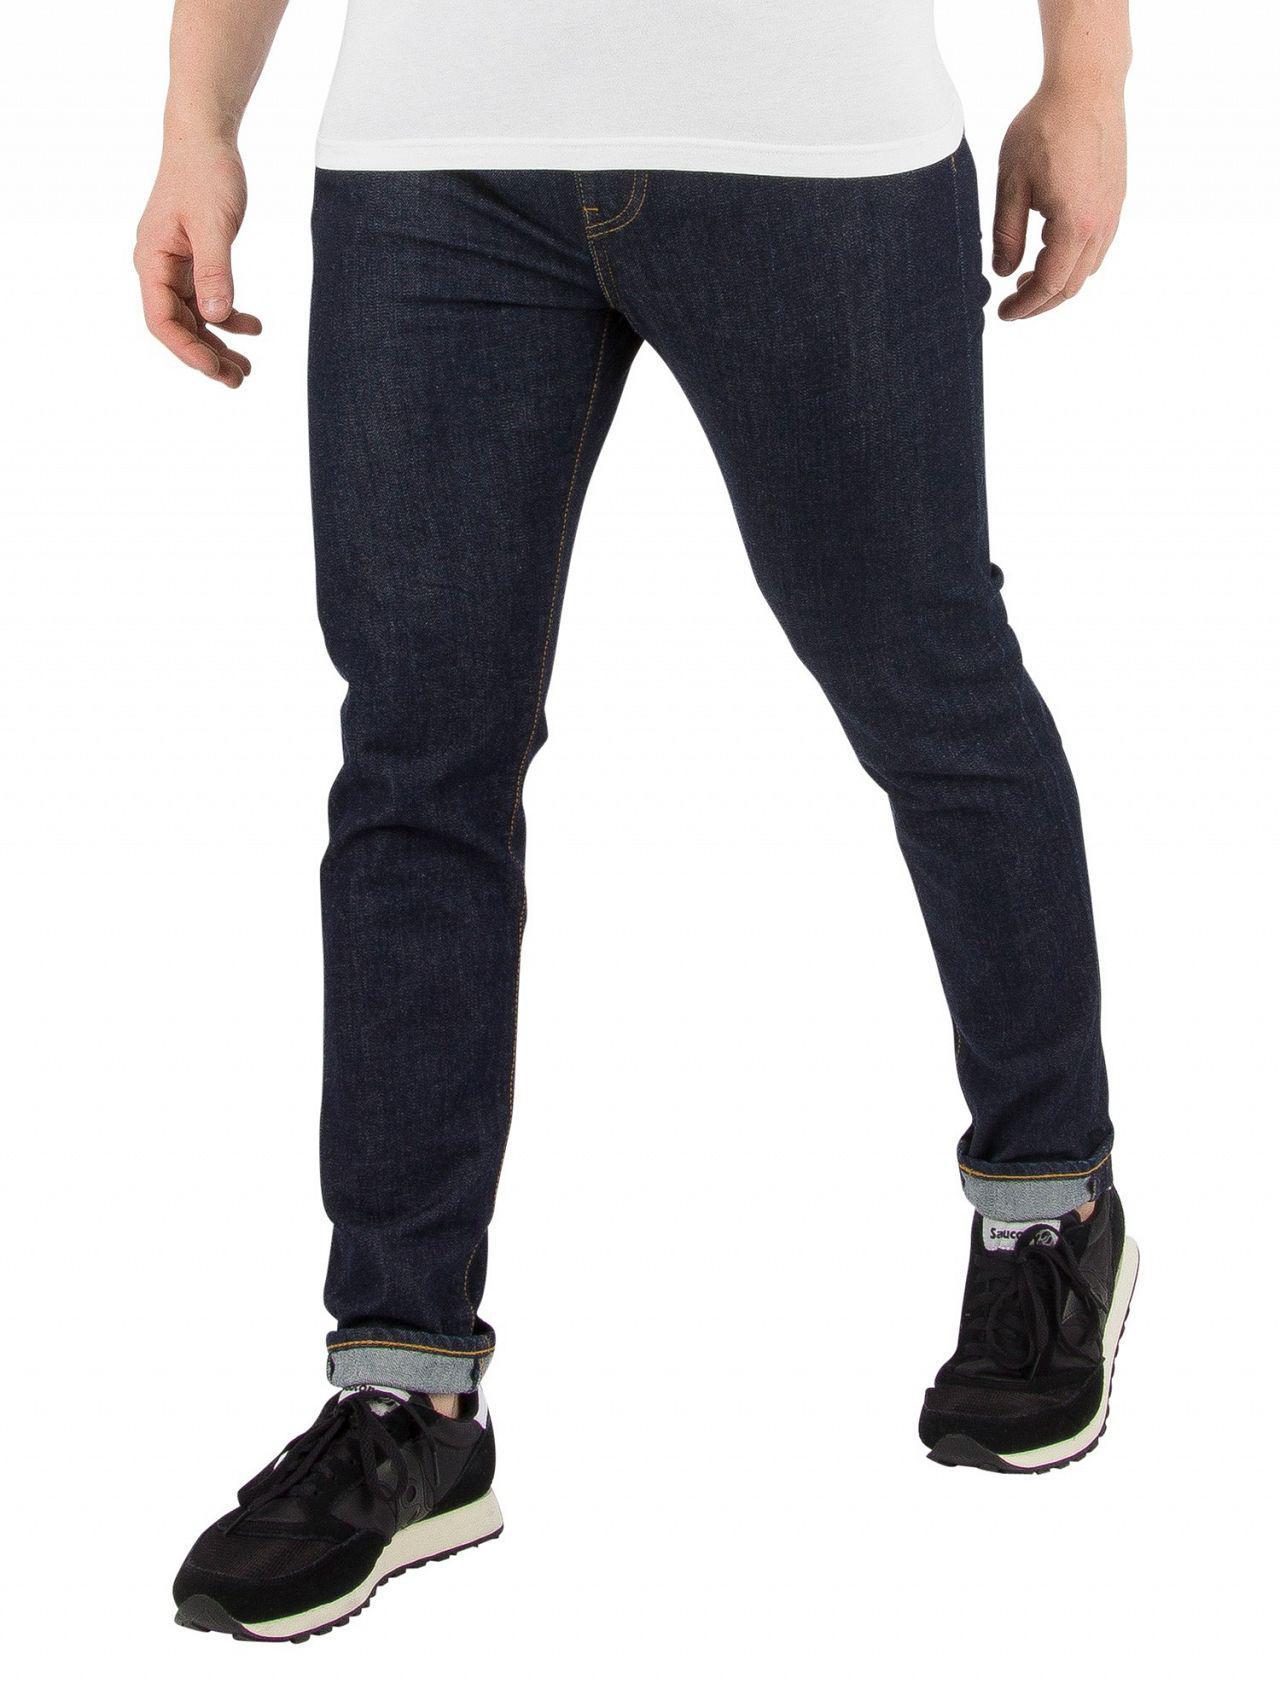 9dbddec232cc Levi s Rock Cod 512 Slim Taper Fit Jeans in Blue for Men - Lyst